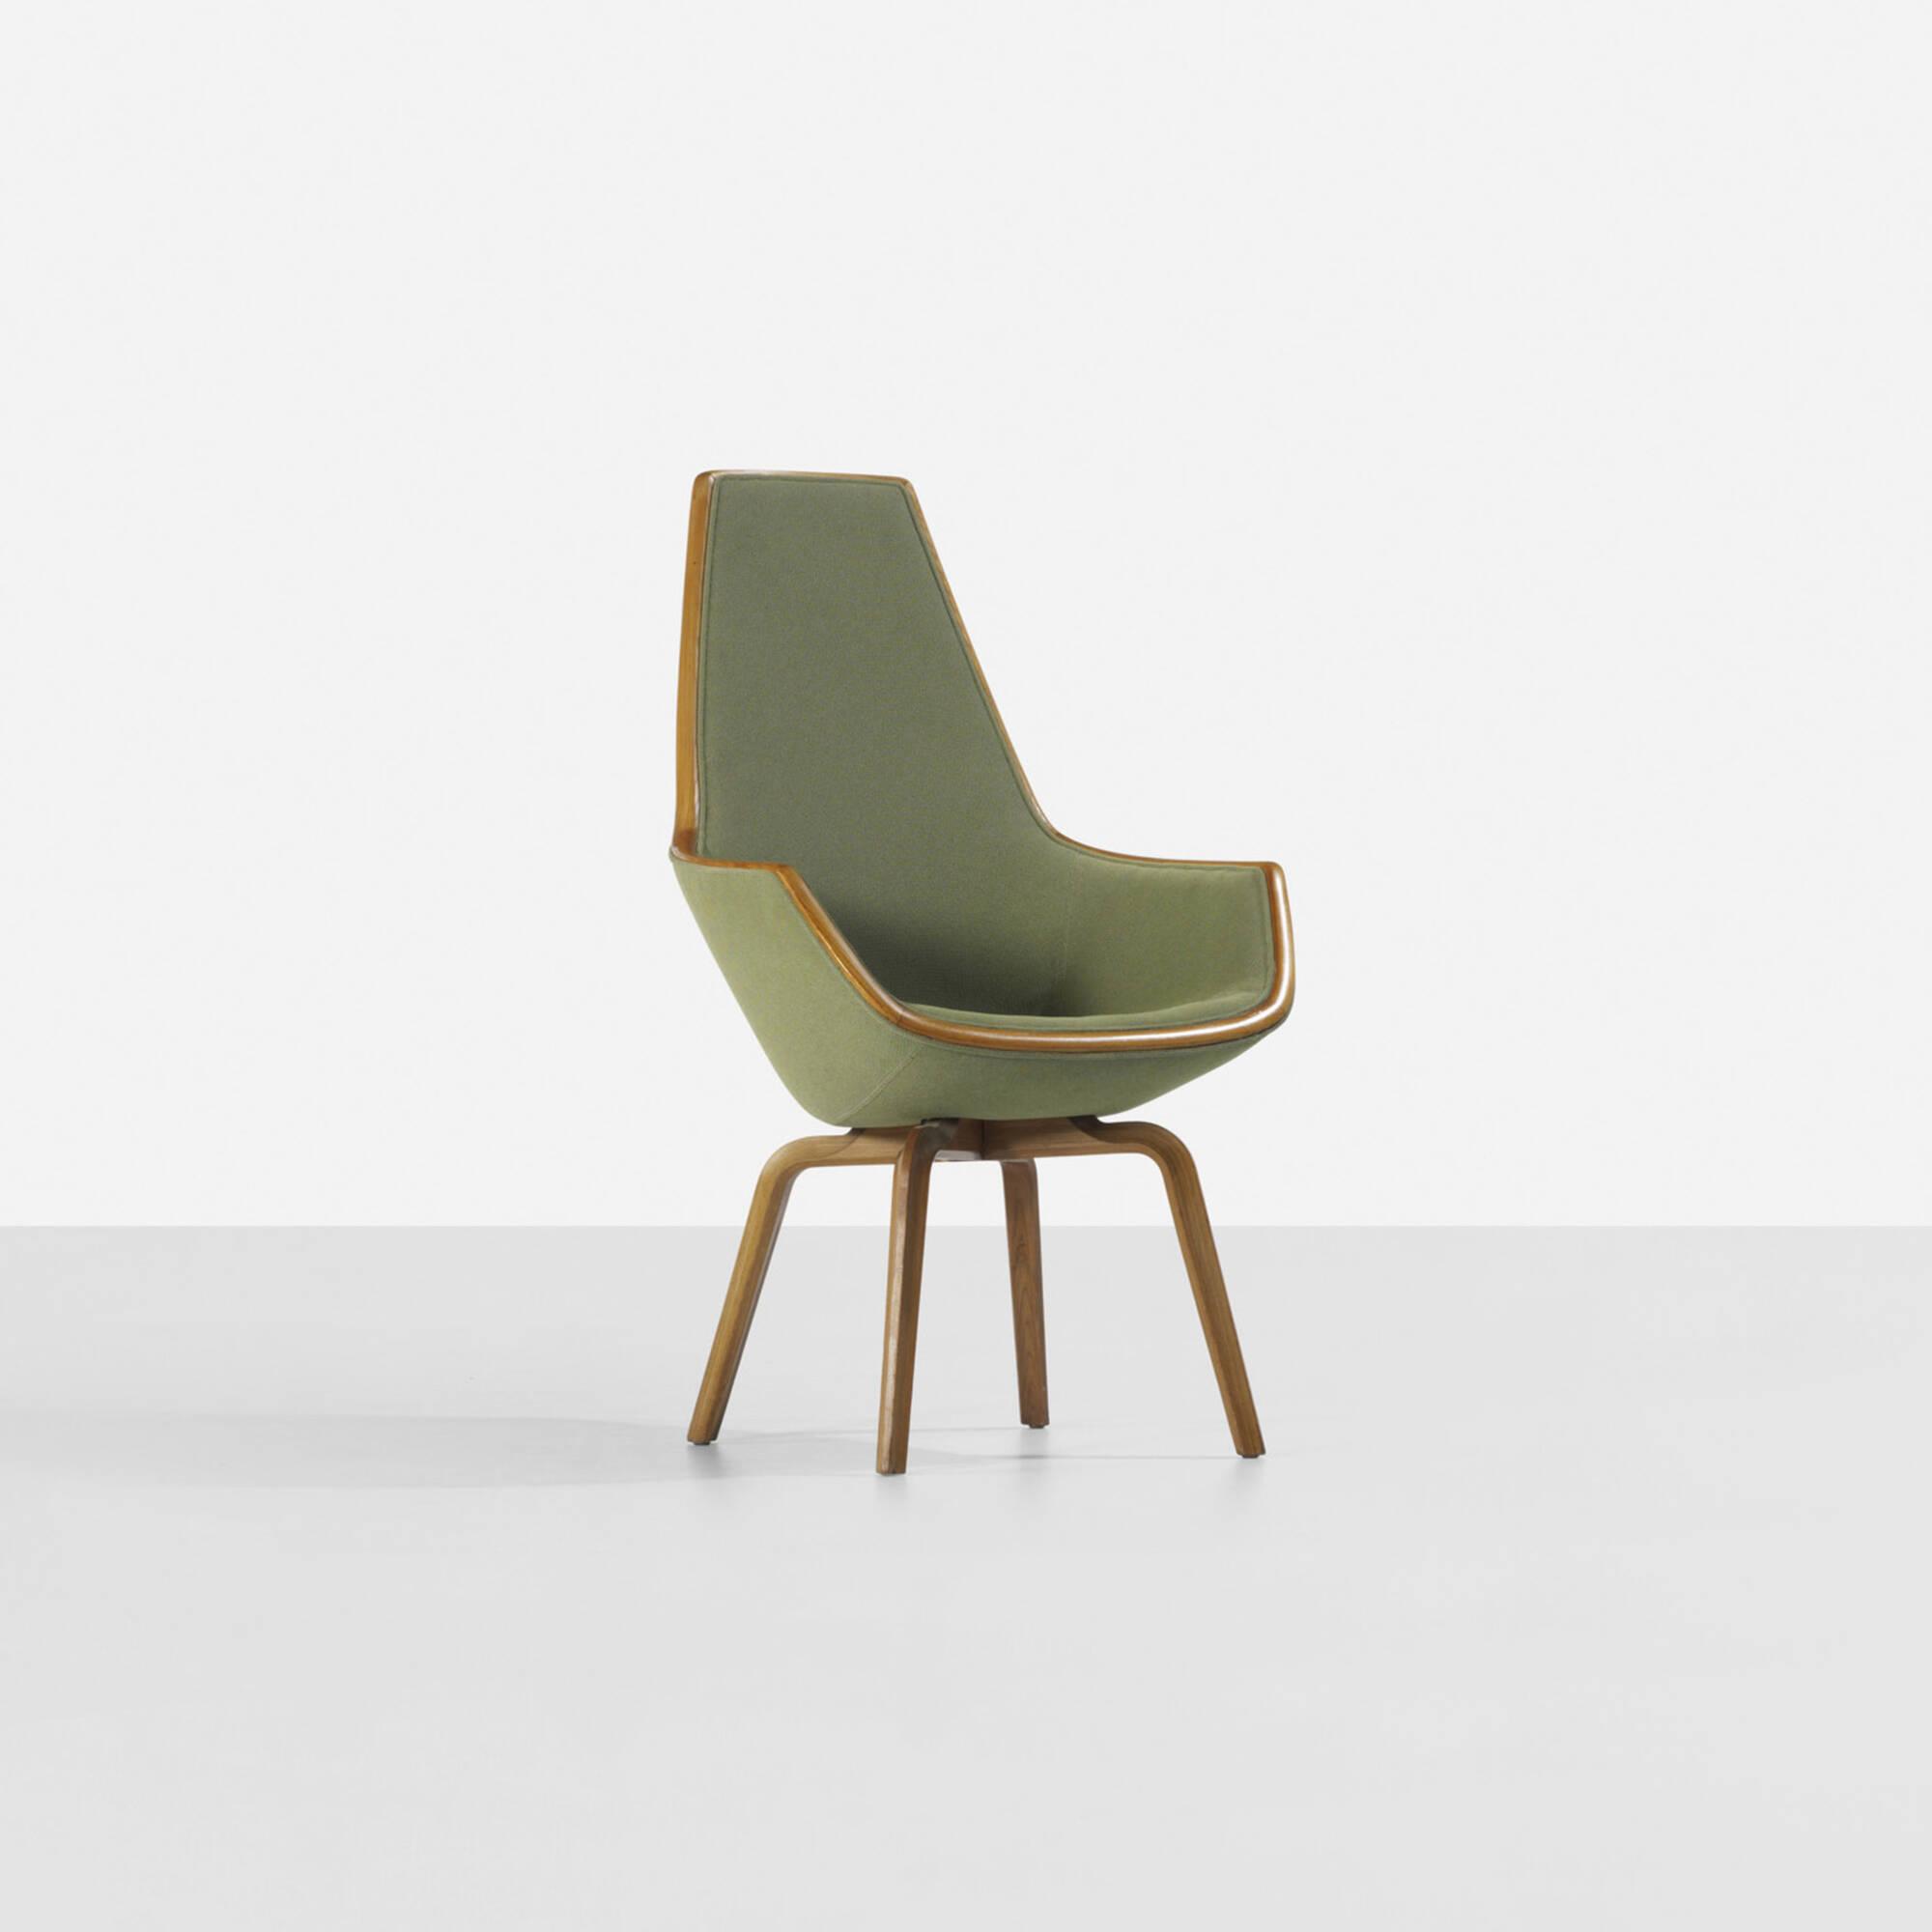 chaise arne jacobsen perfect chaise bar tolix silla terek. Black Bedroom Furniture Sets. Home Design Ideas